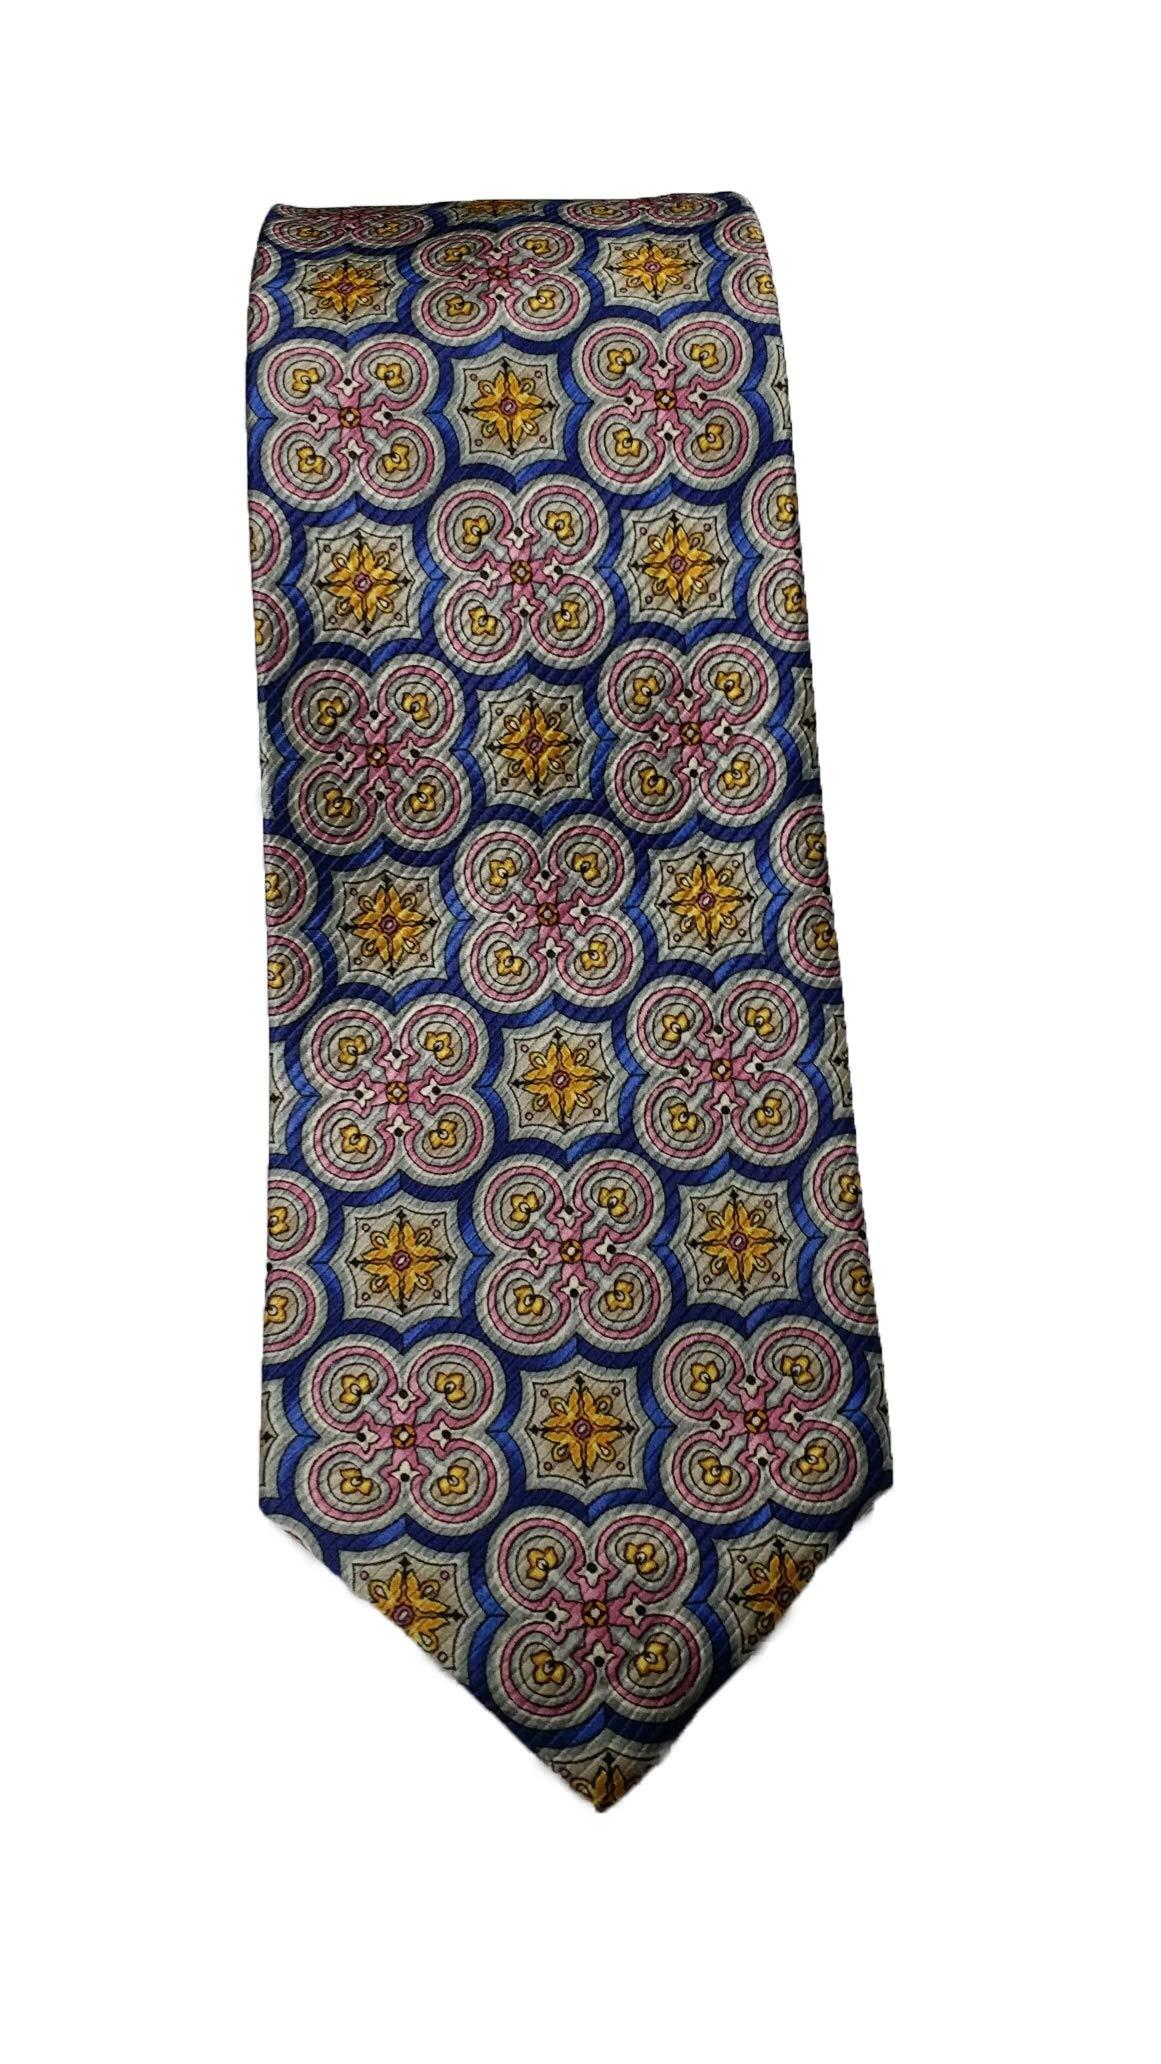 Robert Talbott Blue and Pink Medallion Heritage Seven Fold Tie